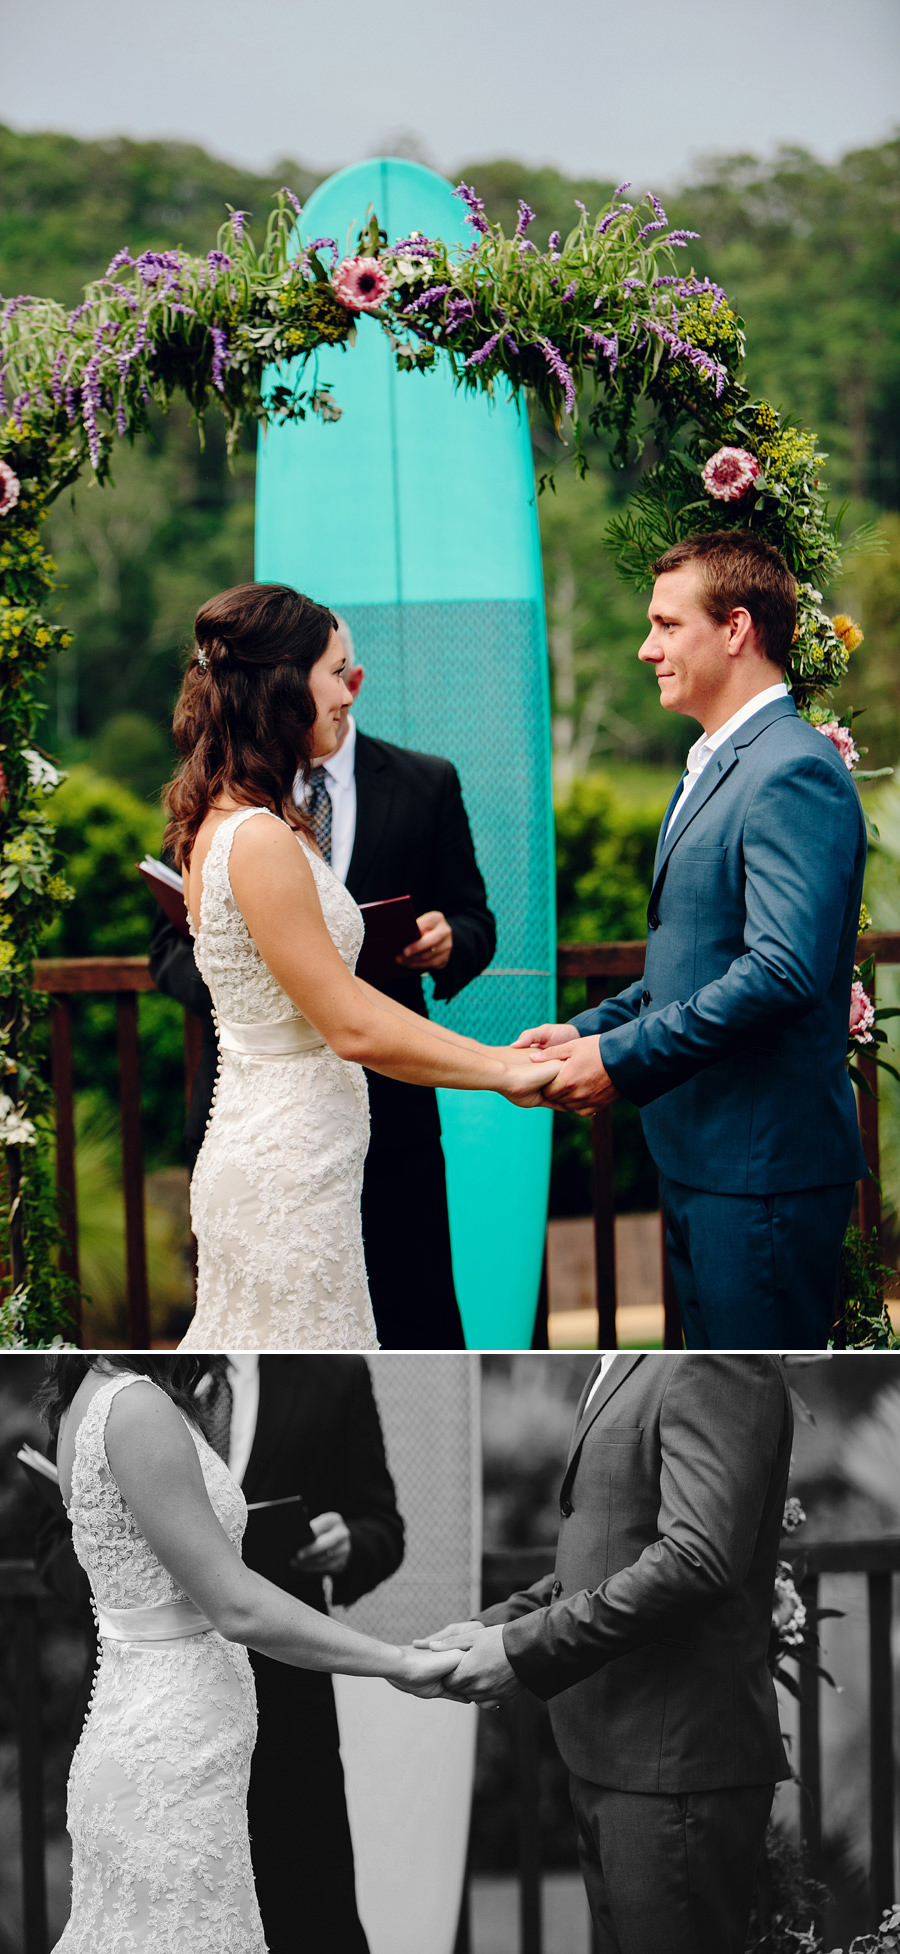 Urunga Wedding Photography: Ceremony